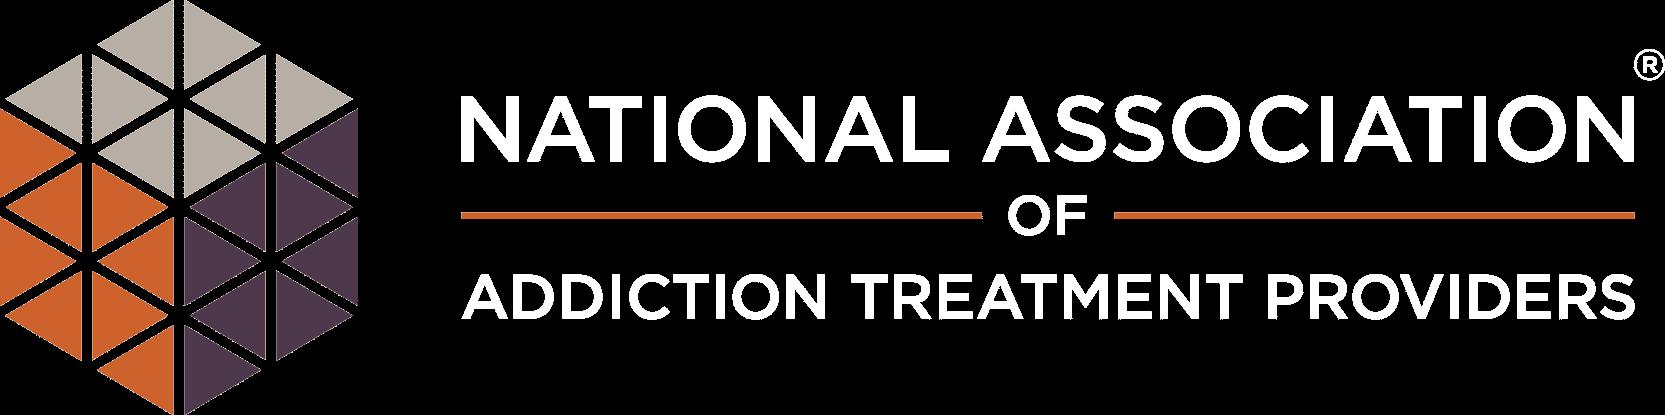 National Association of Addiction Treatment Providers Logo